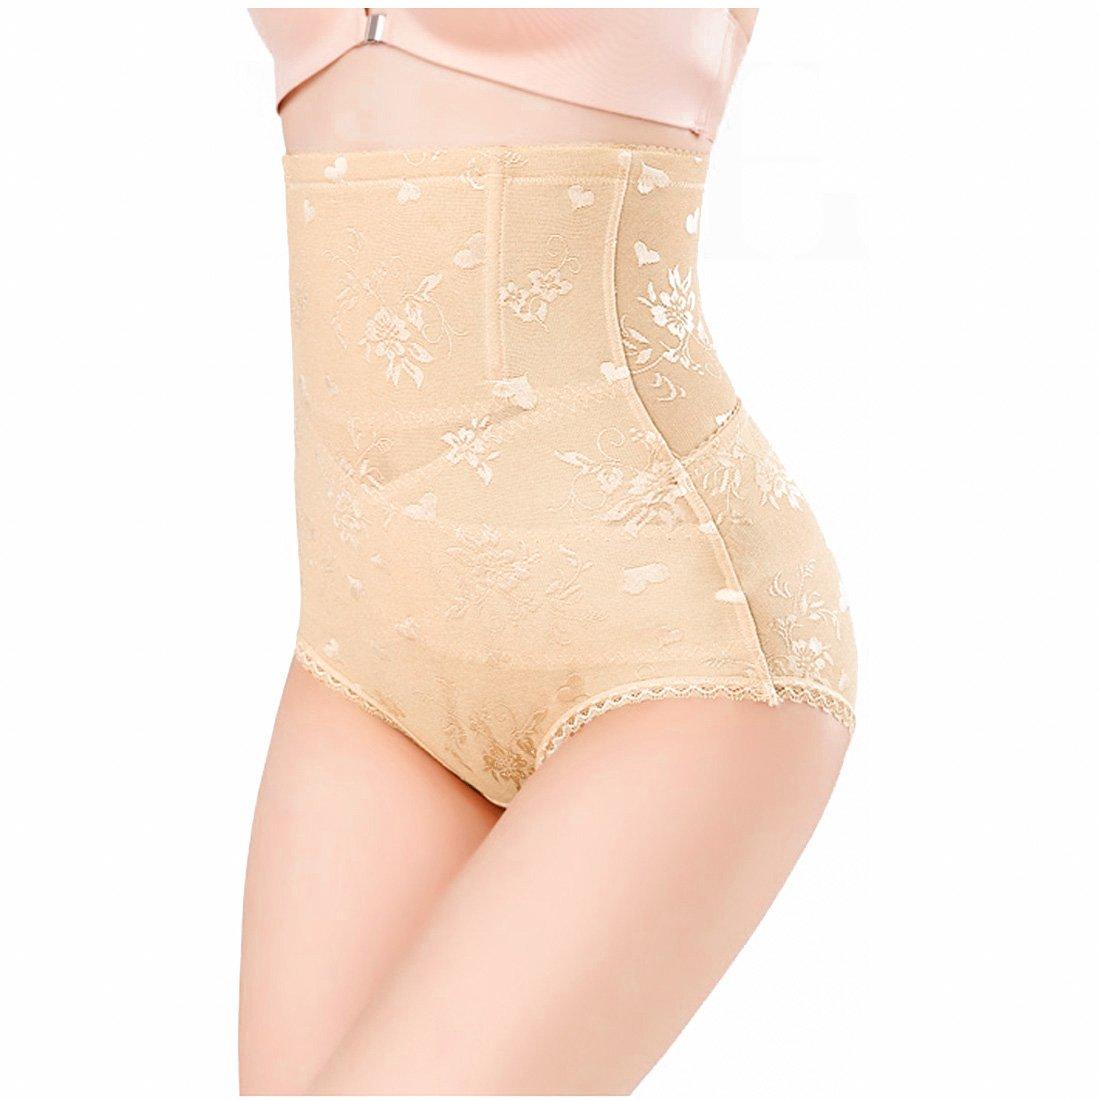 DreamLark Shapewear for Women,High Waist Smooth Breathable Girldles Seamless Body Shaper(New Version) (US Size XXL=Tag XXXL, Beige)